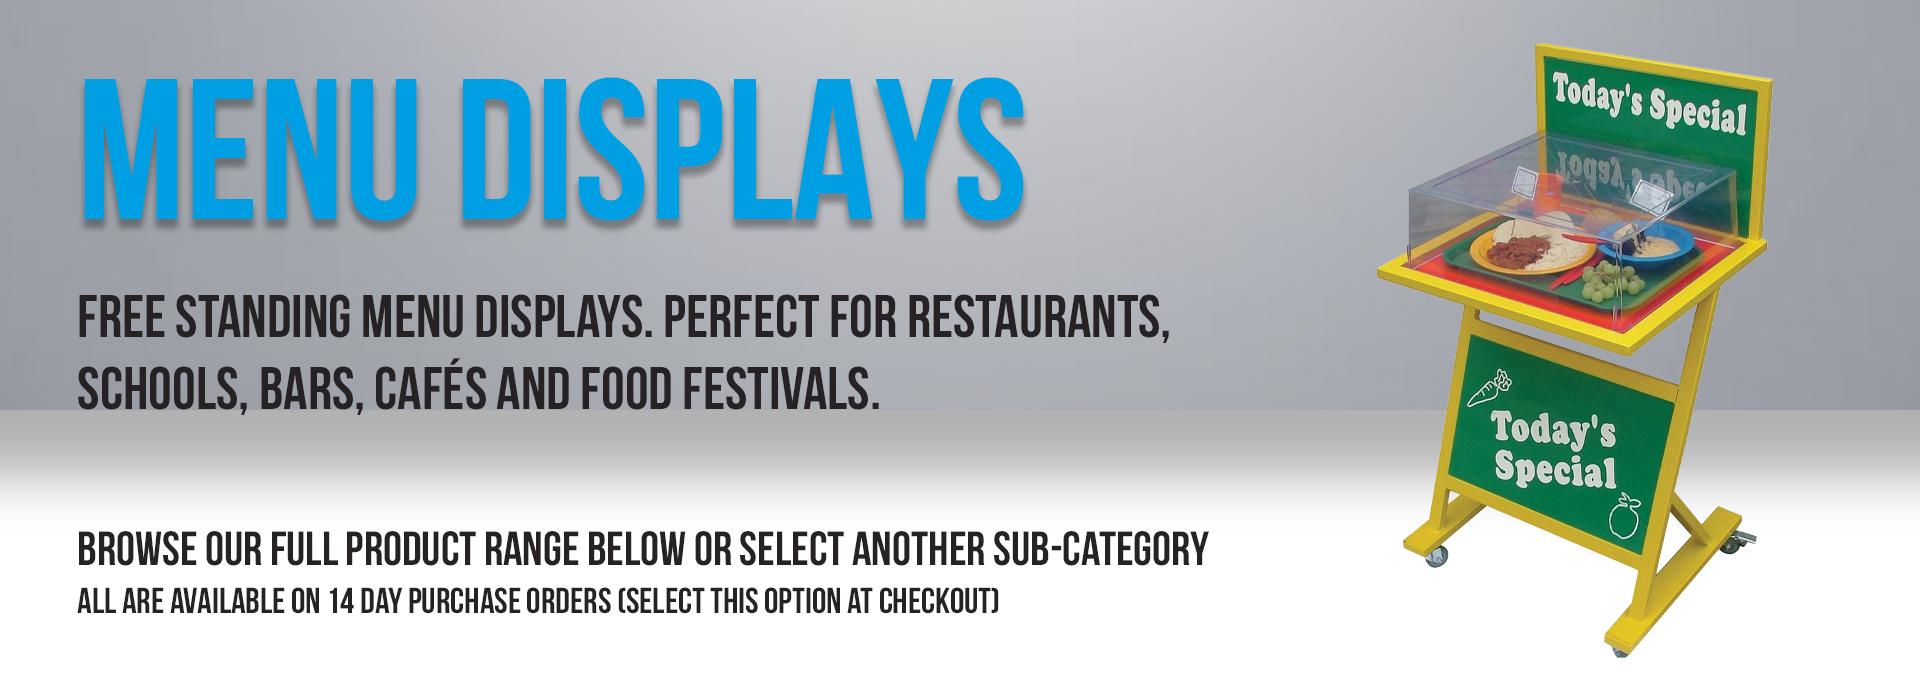 menu-displays-banner.jpg